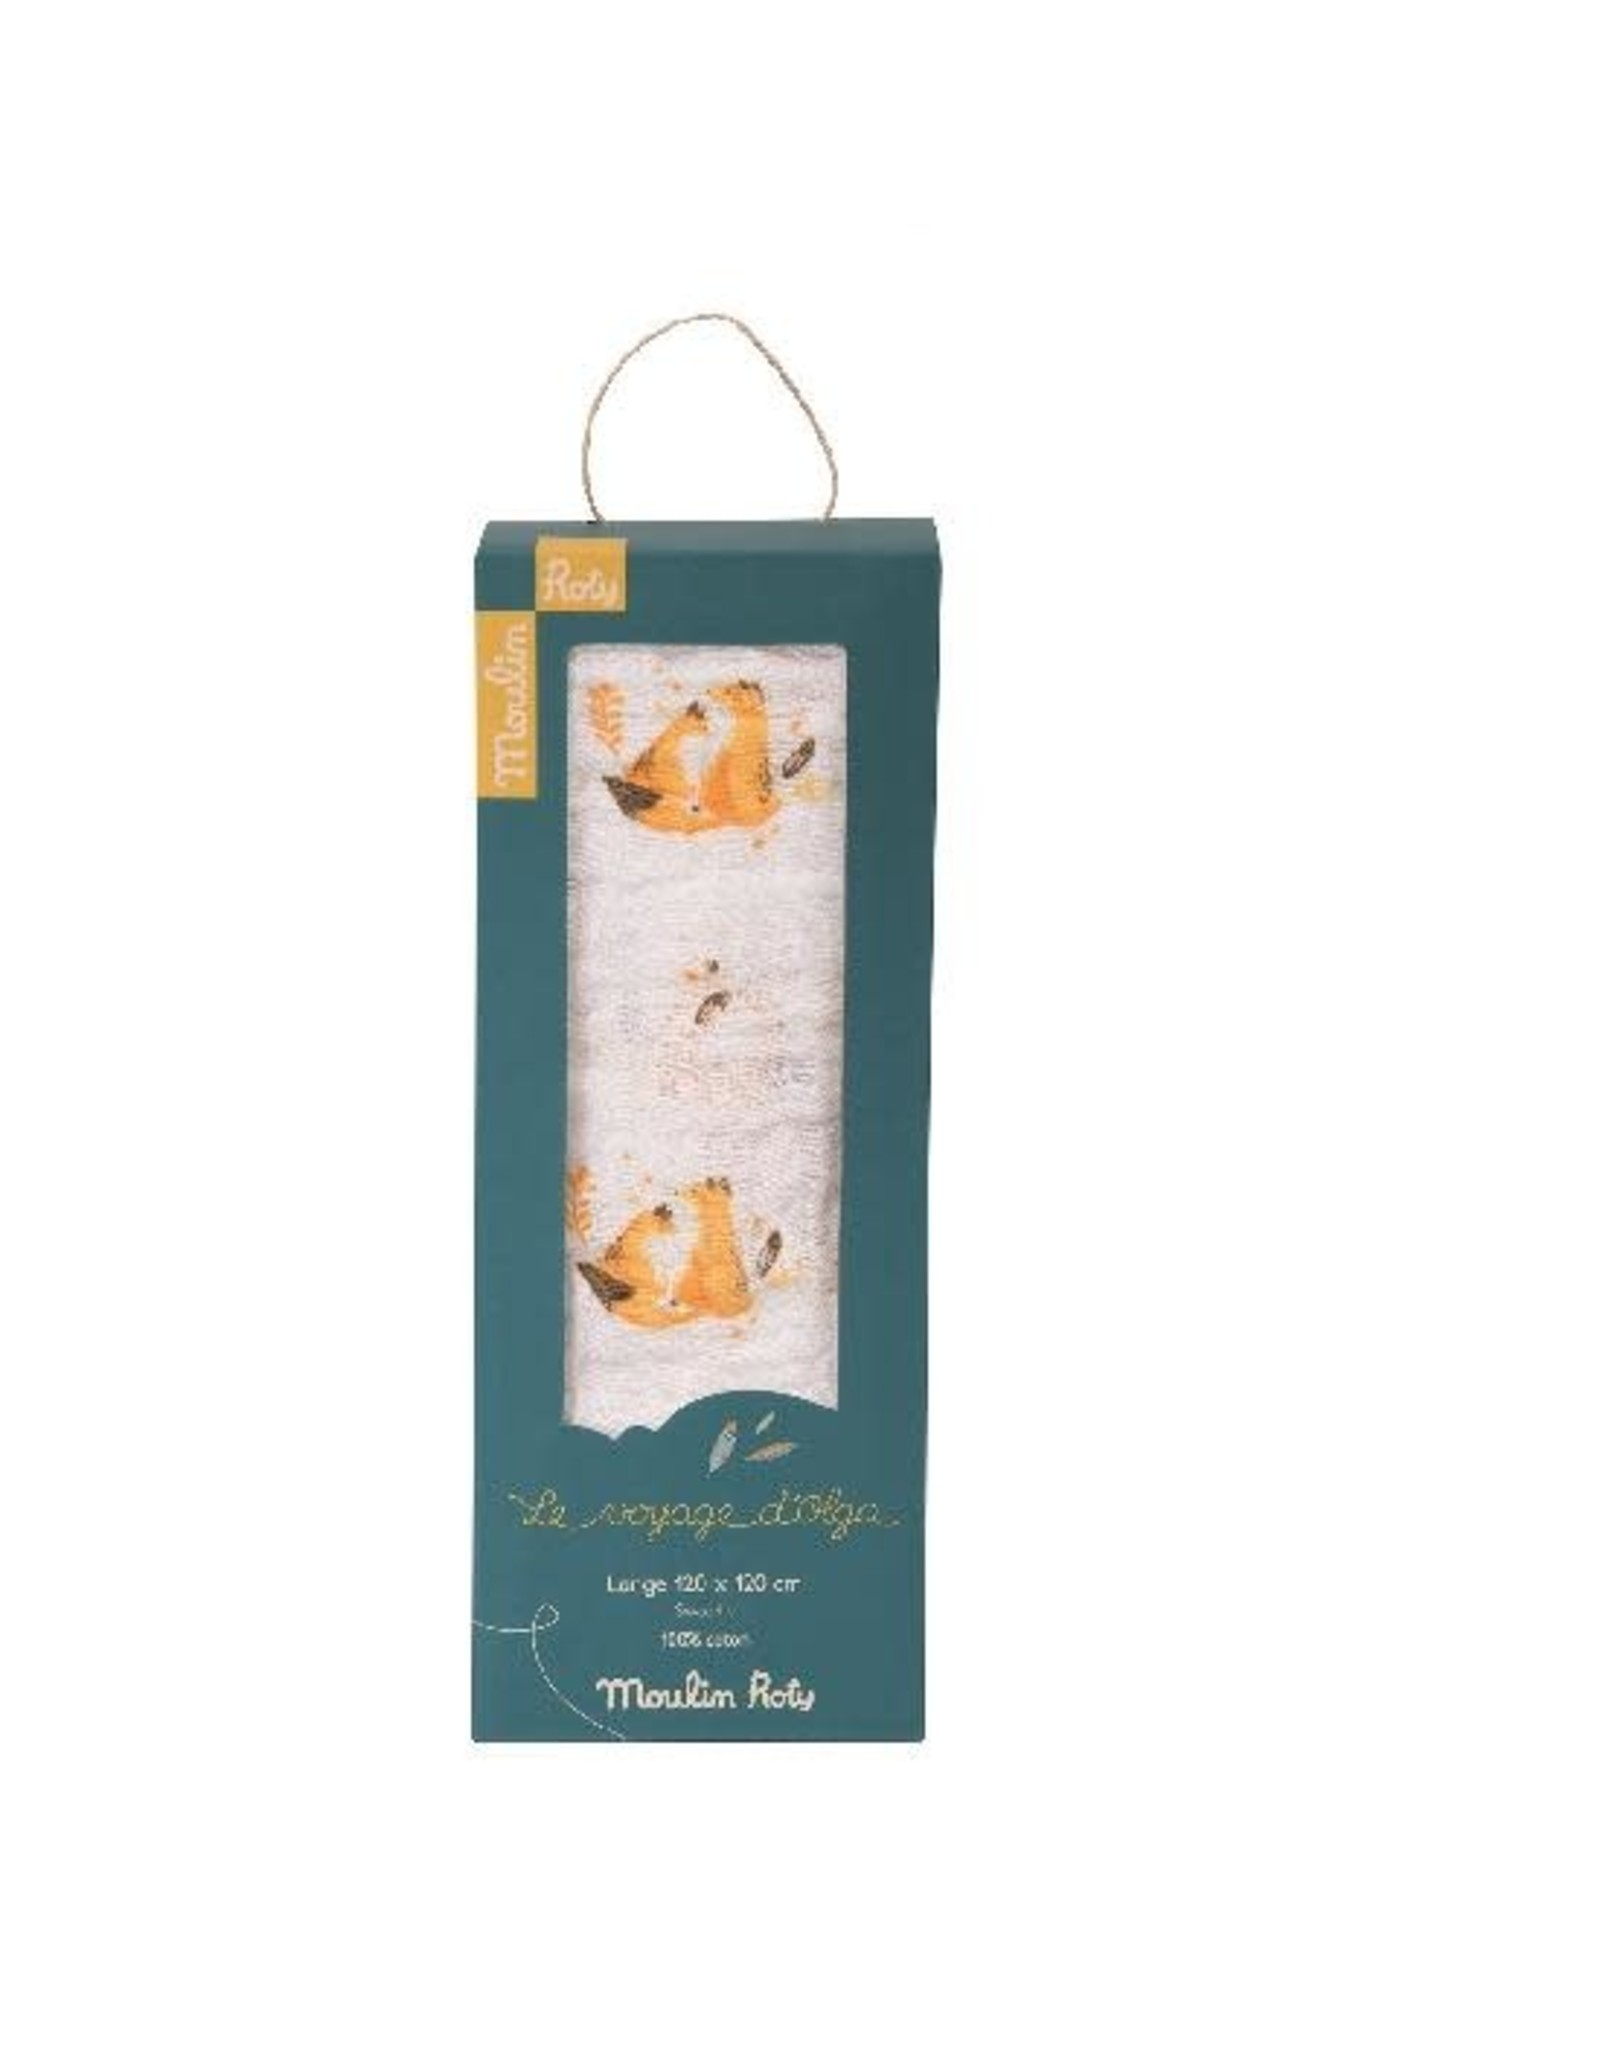 Moulin Roty Le Voyage d'Olga Fox Muslin Swaddle Blanket 120x120cm